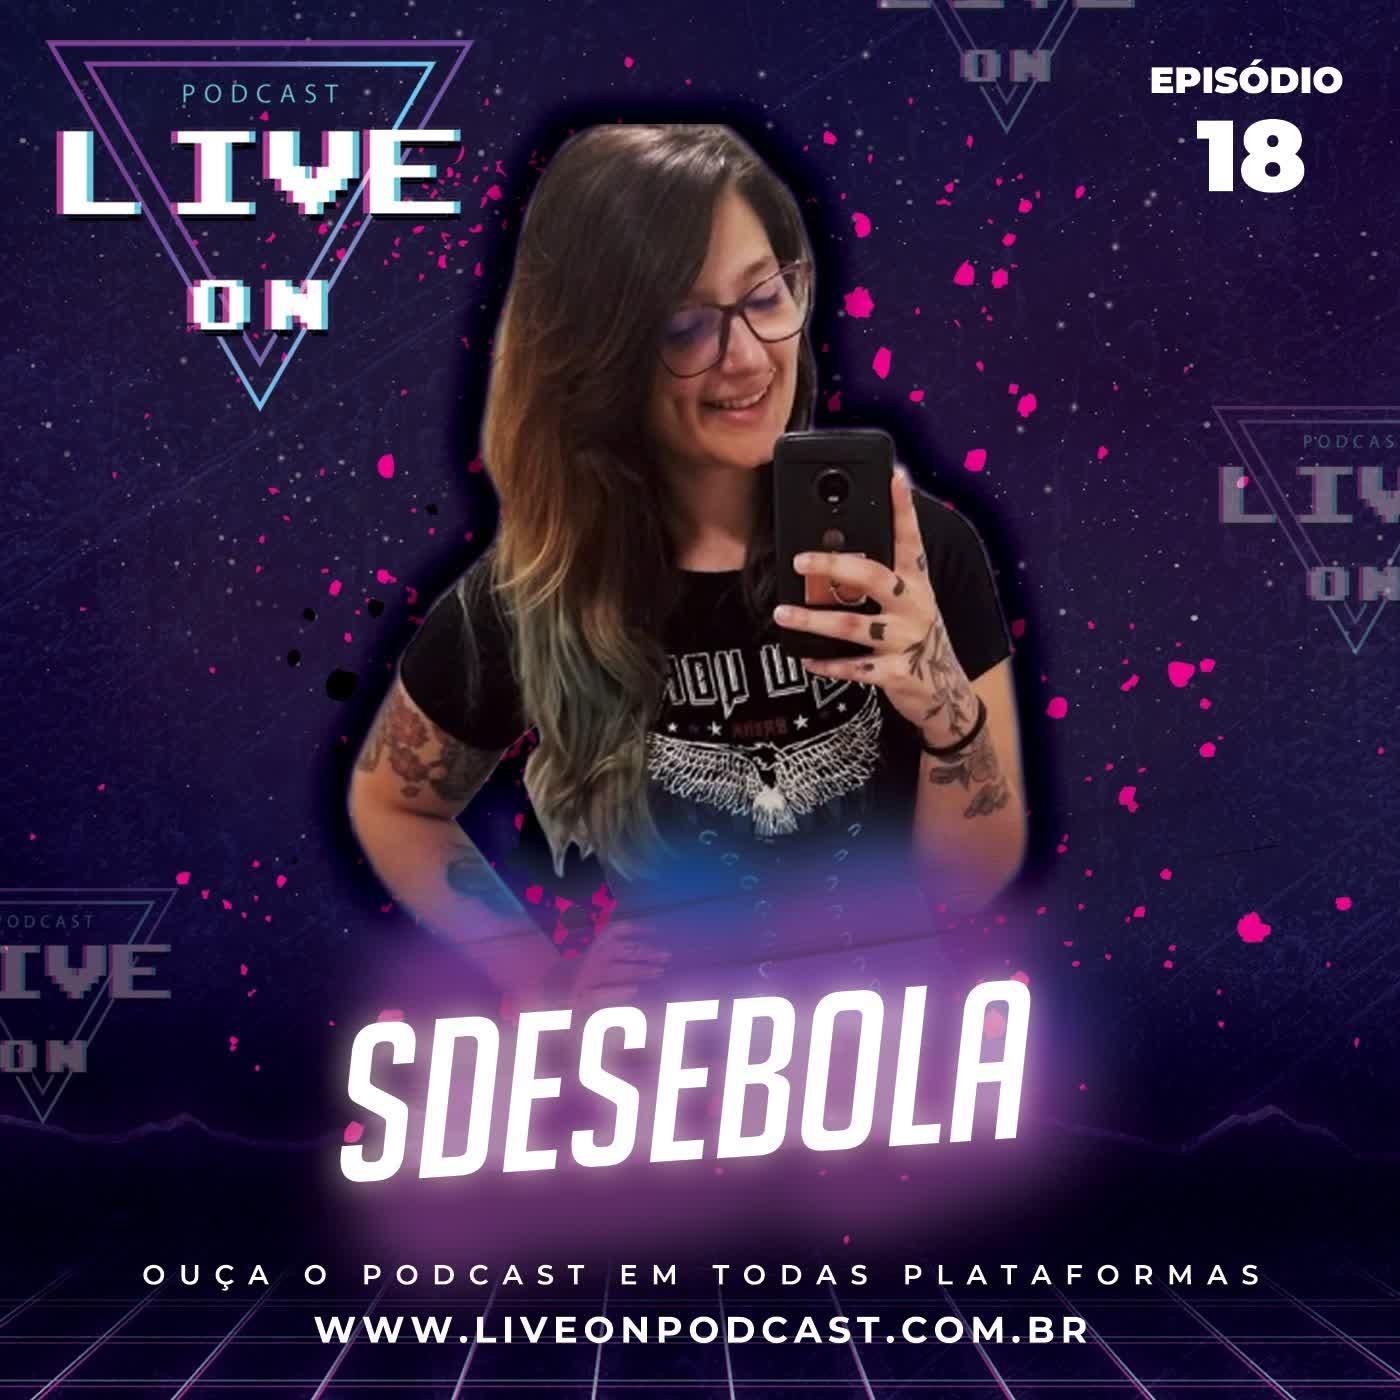 Live On Podcast - Convidada: S de Sebola - Episódio 18